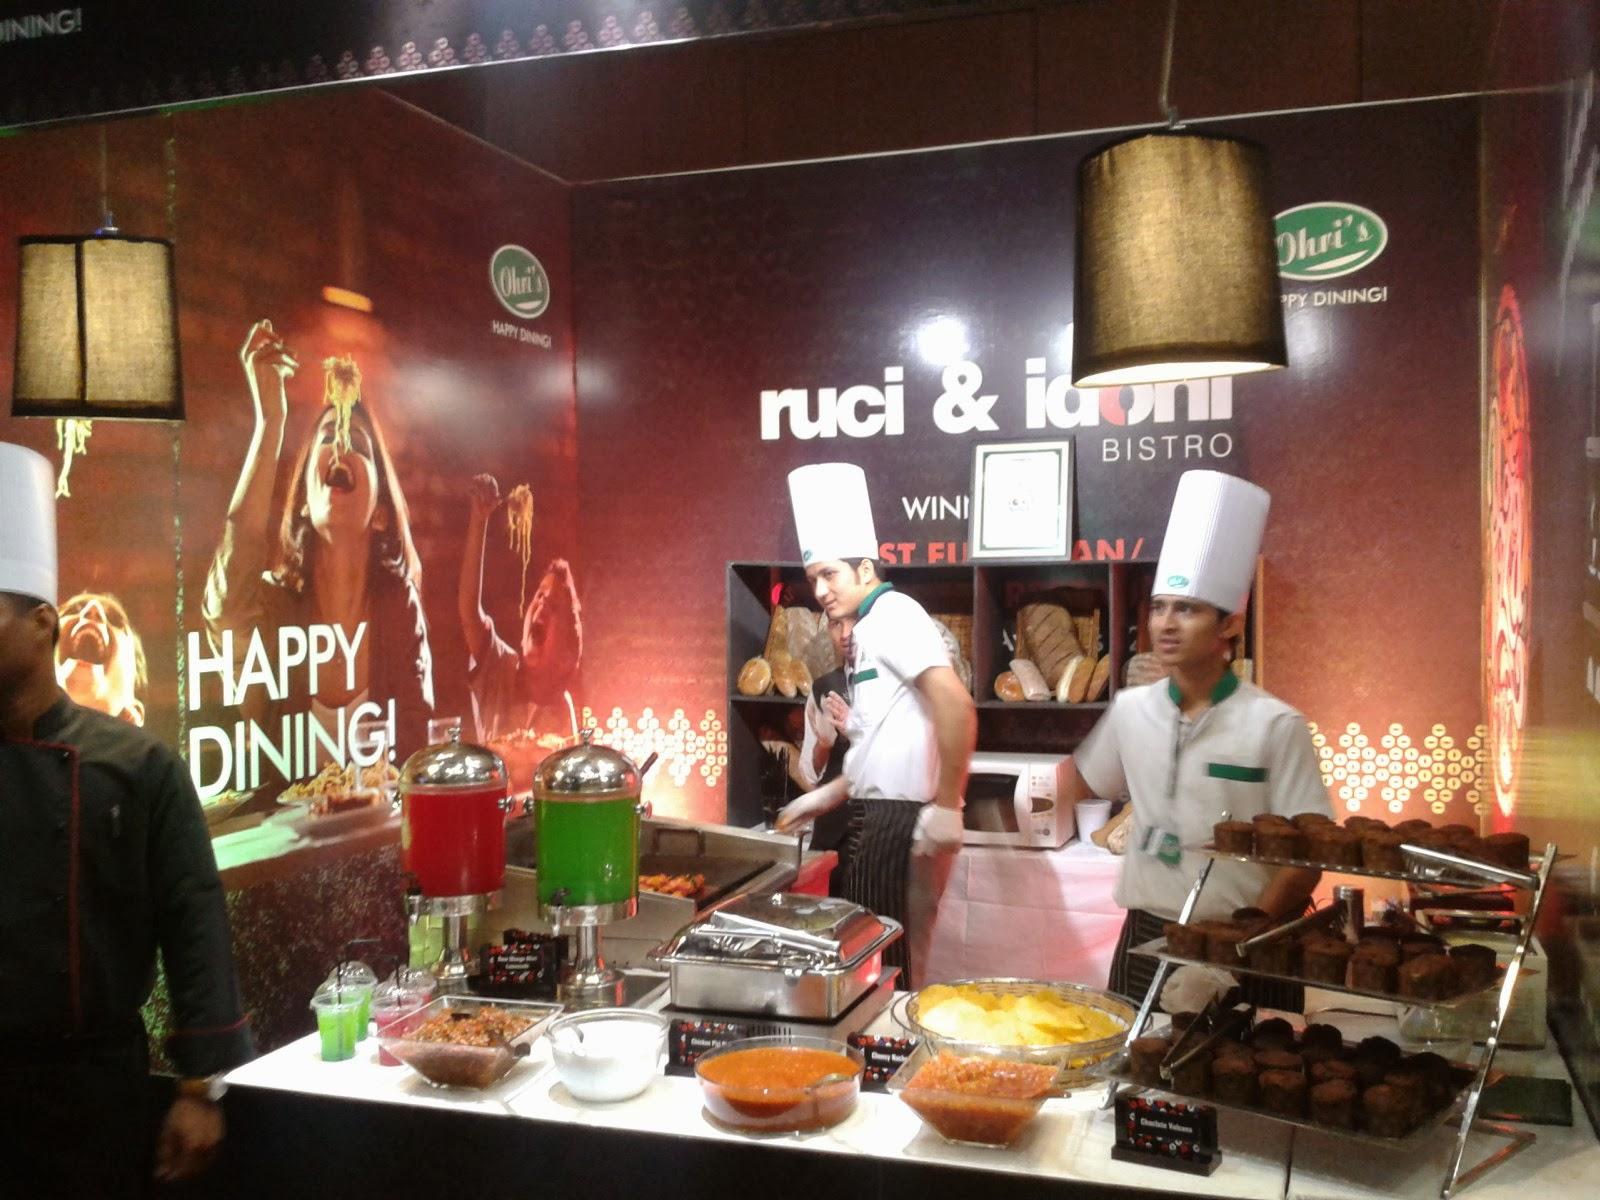 Hyderabad Times Food award Ruci and Idoni